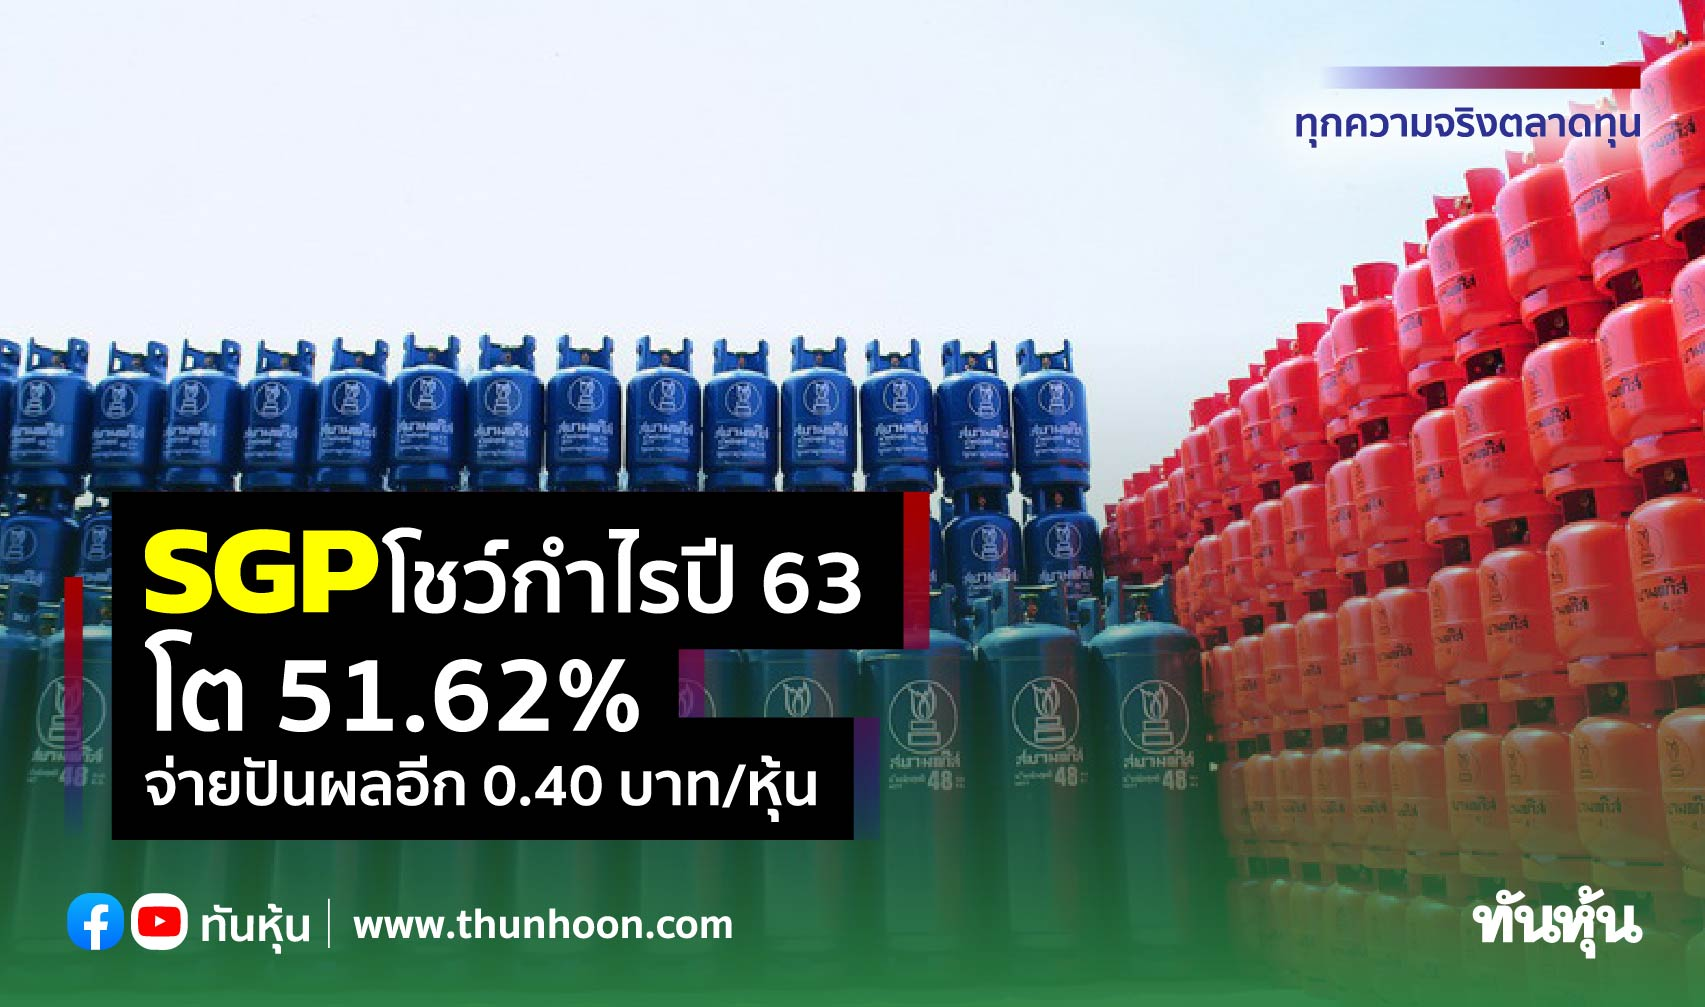 SGP โชว์กำไรปี 63 โต 51.62% จ่ายปันผลอีก 0.40 บาท/หุ้น